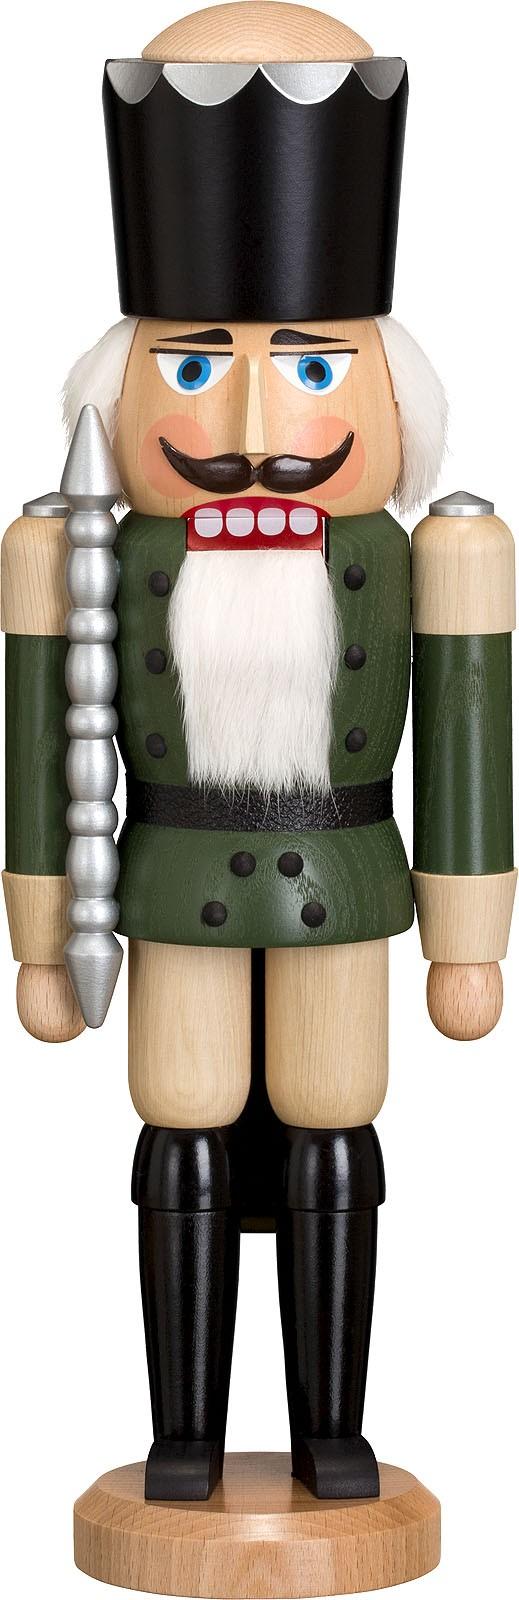 Nussknacker König, Esche lasiert, grün, 38 cm